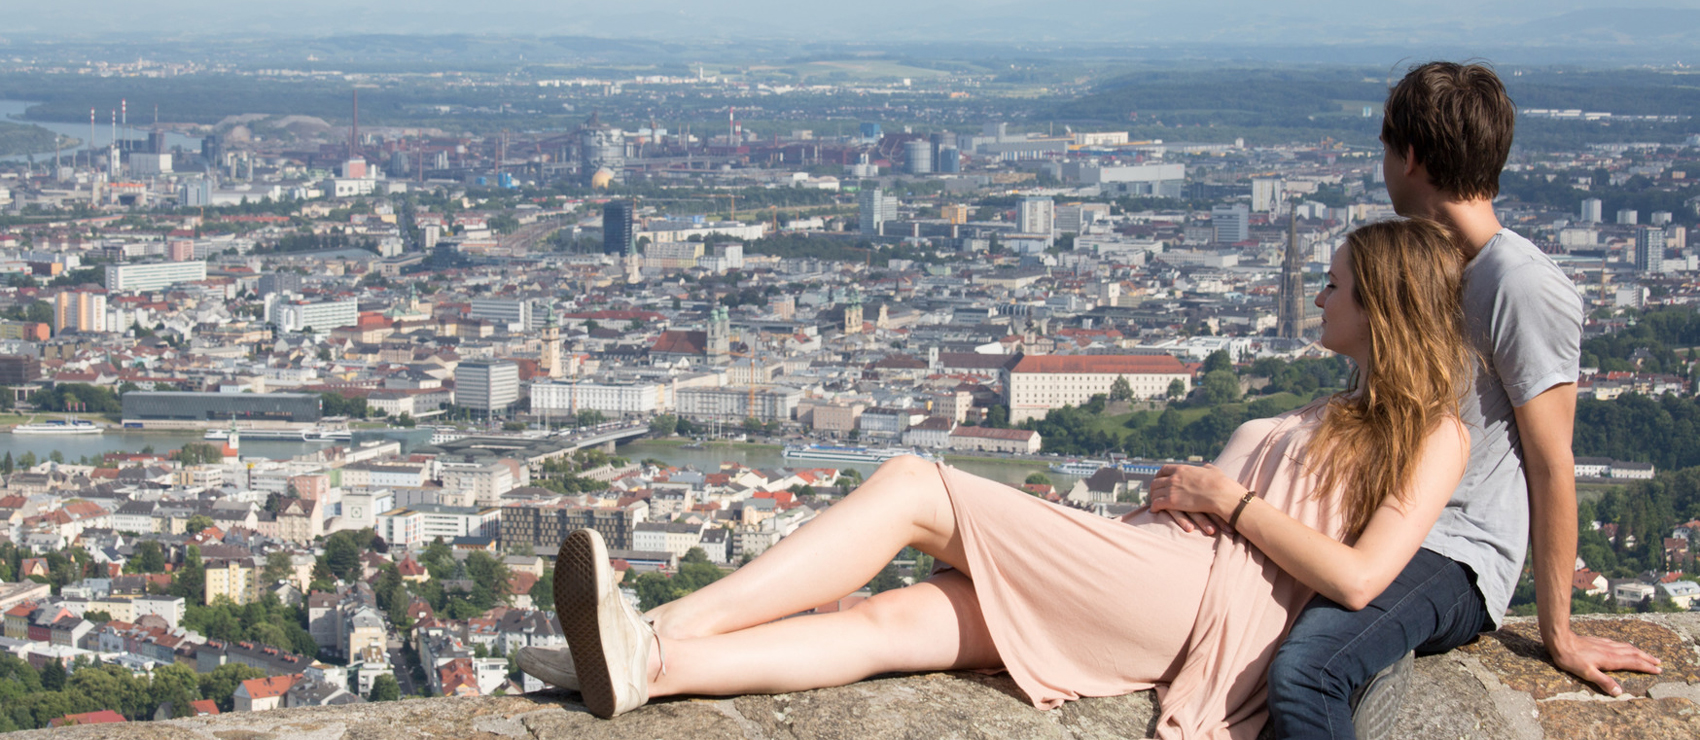 Linz Aussicht / © Linz Tourismus Tom Mesic